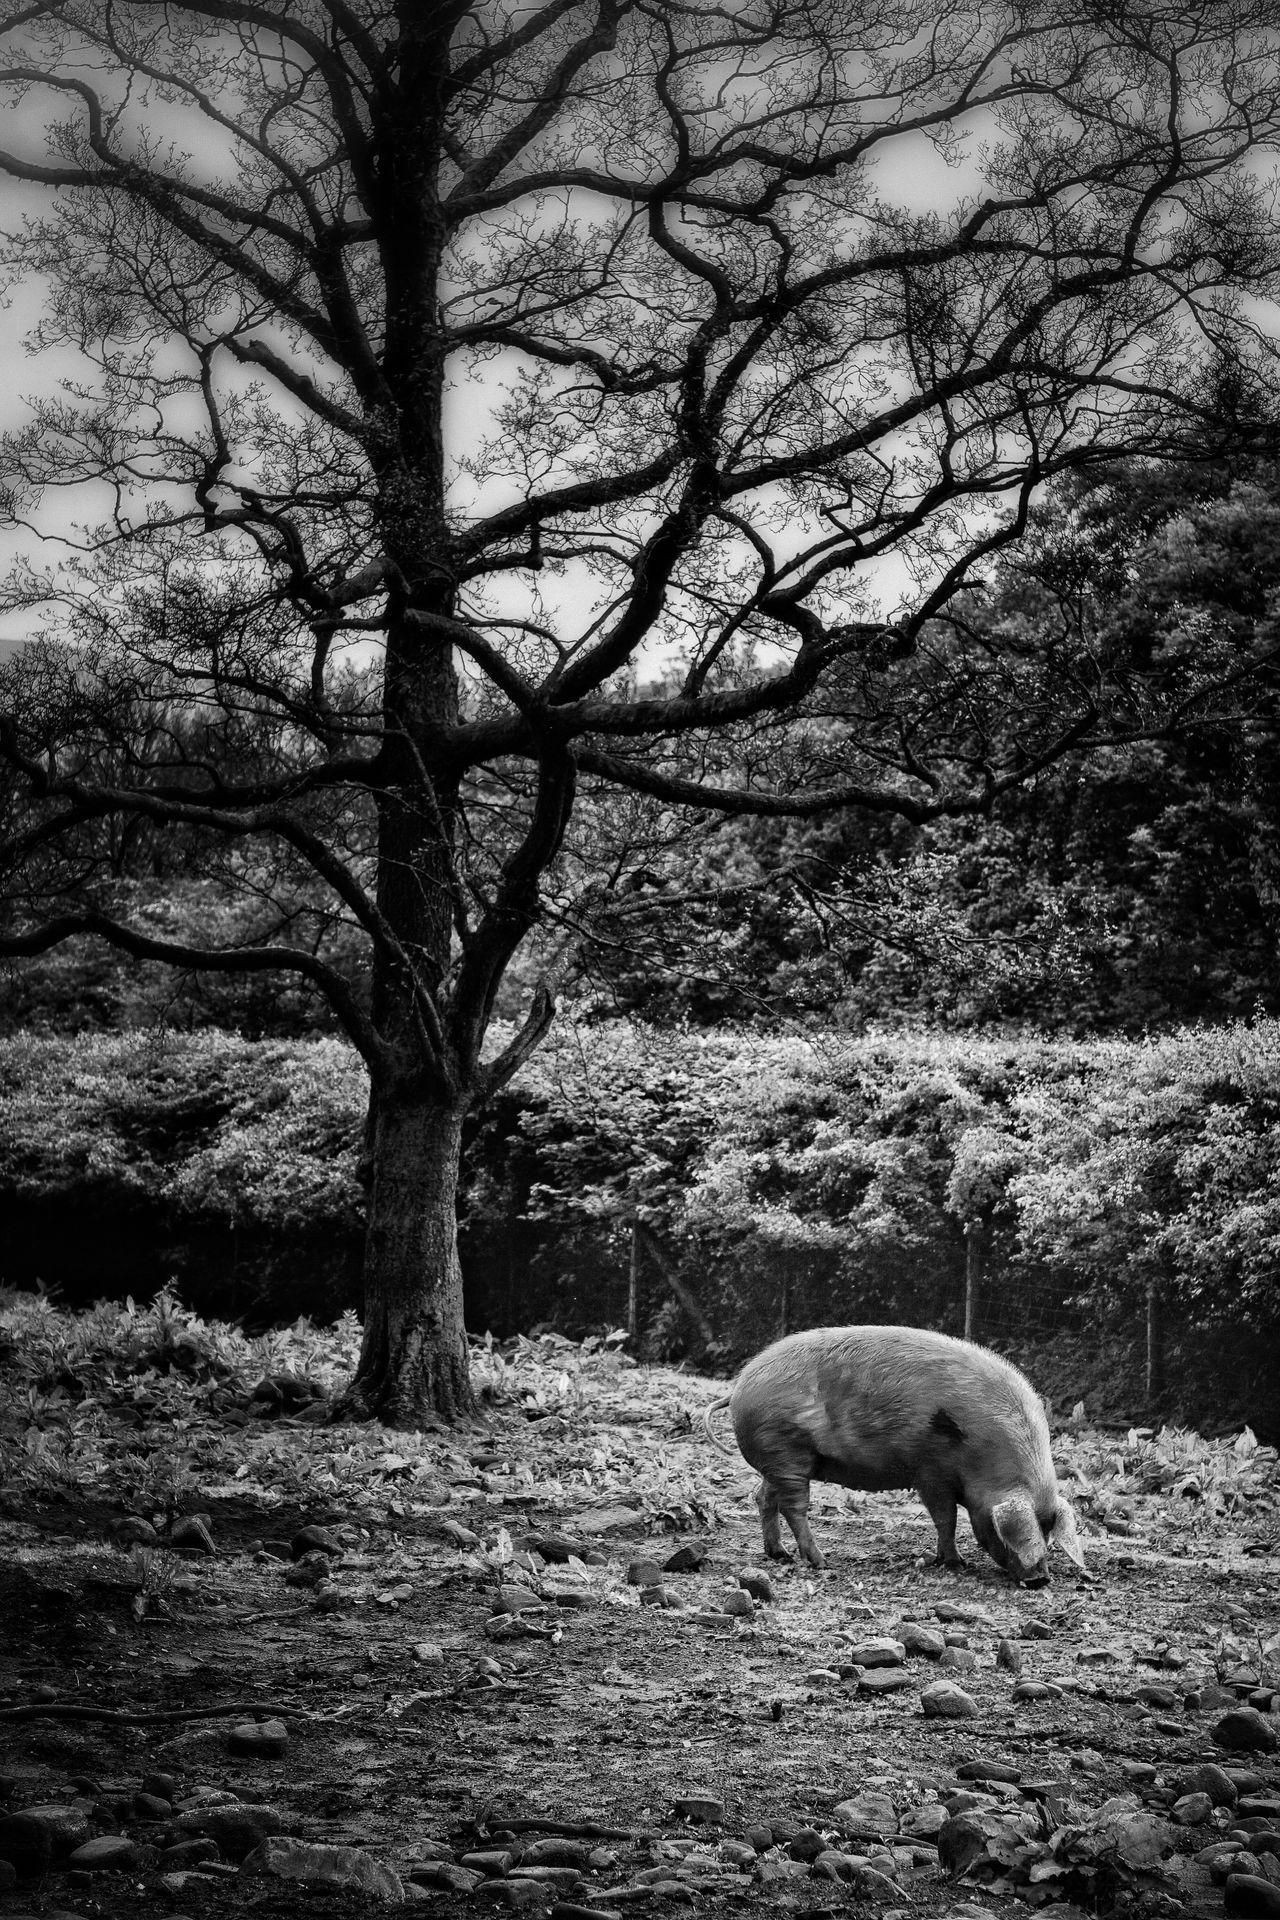 Pig Monochrome Black And White Photography Eye4photography  EyeEm Nature Lover Black & White Blackandwhite Photography Black And White Animal Animal Photography Animals Farm Animals Oink